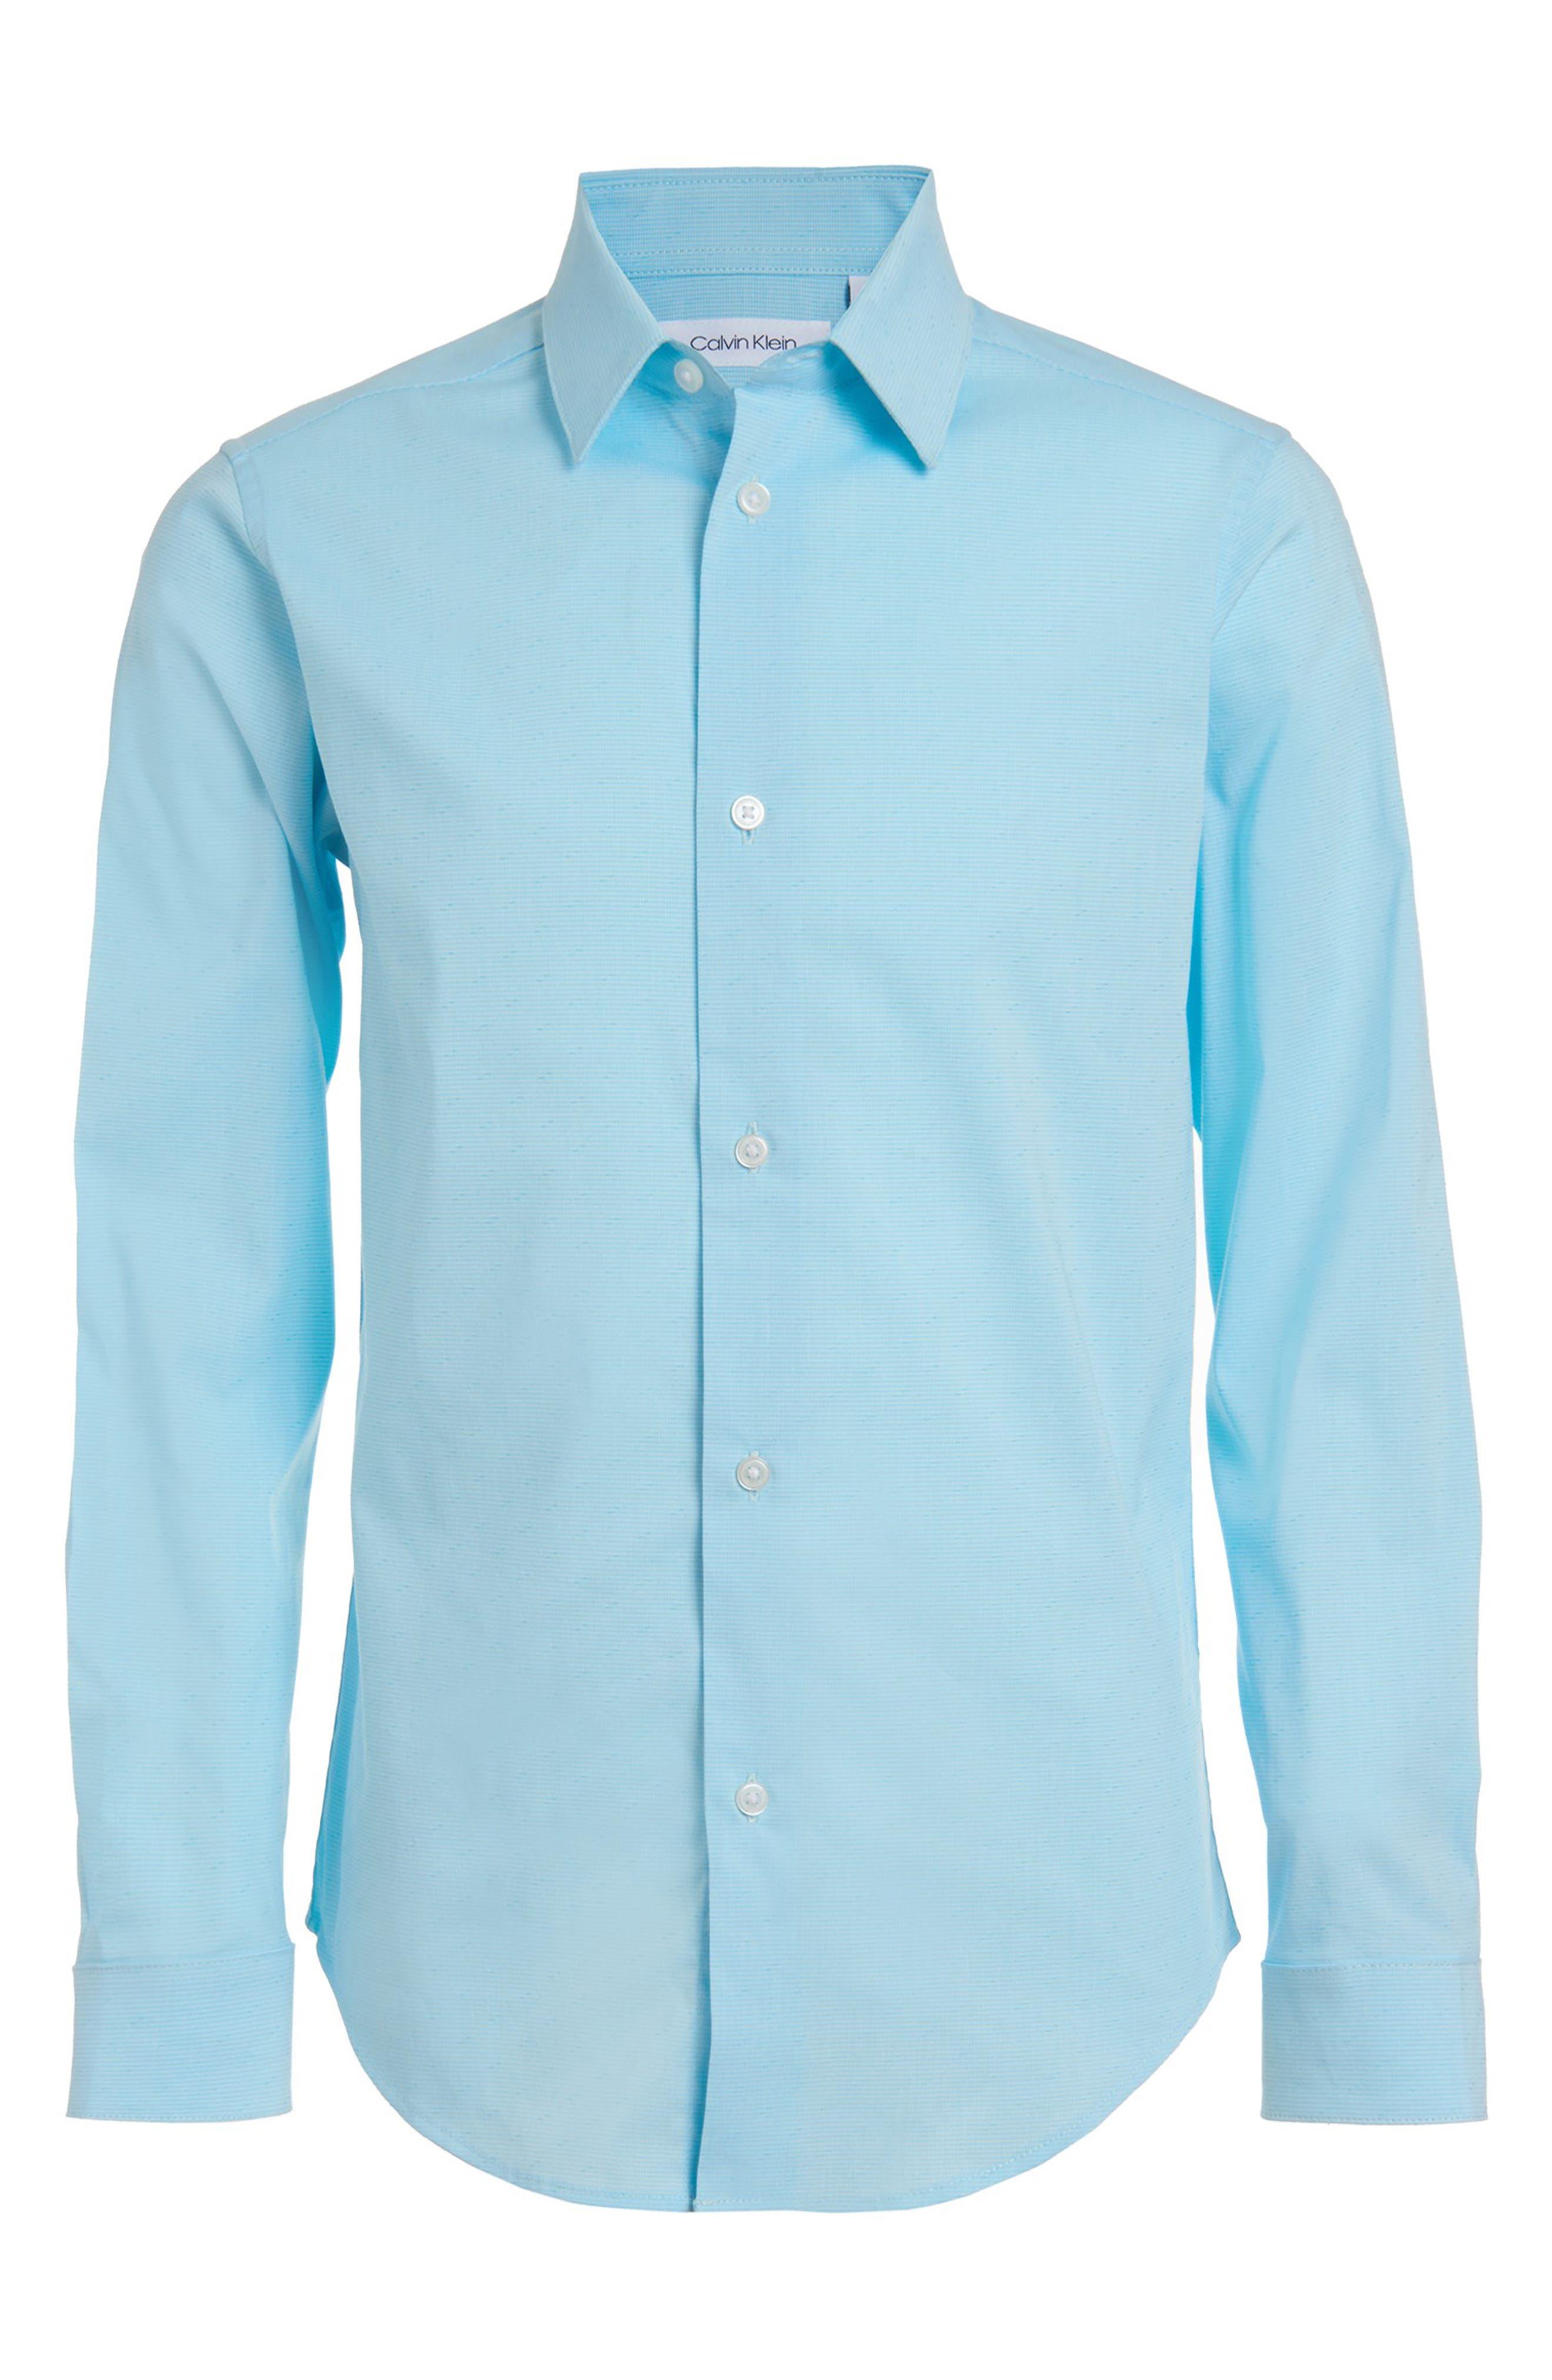 Image of Calvin Klein Long Sleeve Stretch Diagonal Dobby Shirt